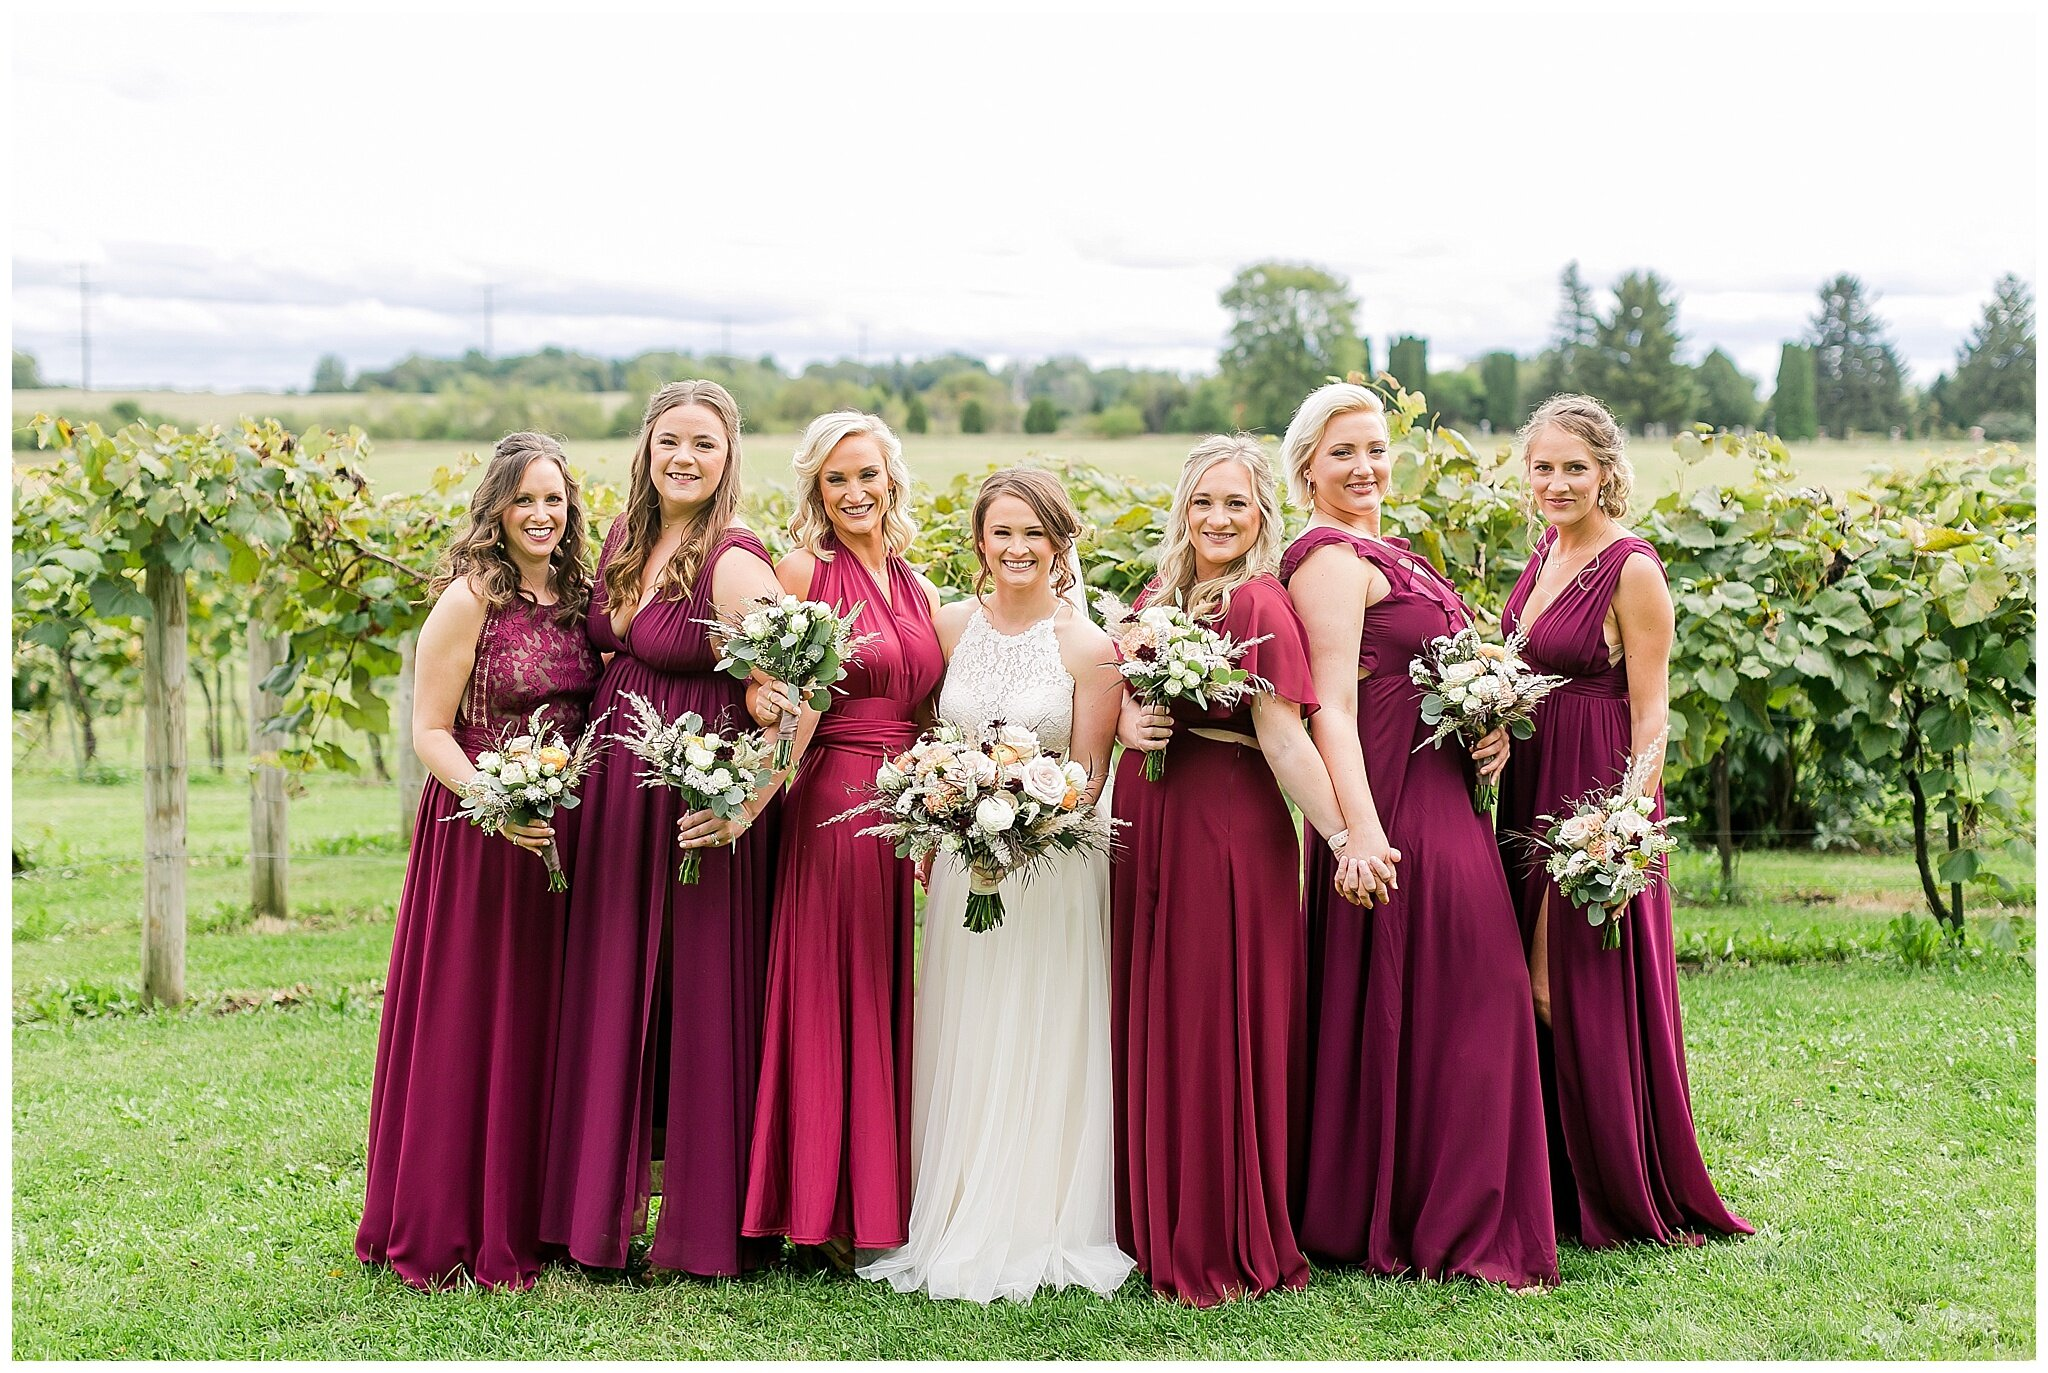 over_the_vines_edgerton_wisconsin_wedding_madison_wisconsin_photographer_0441.jpg